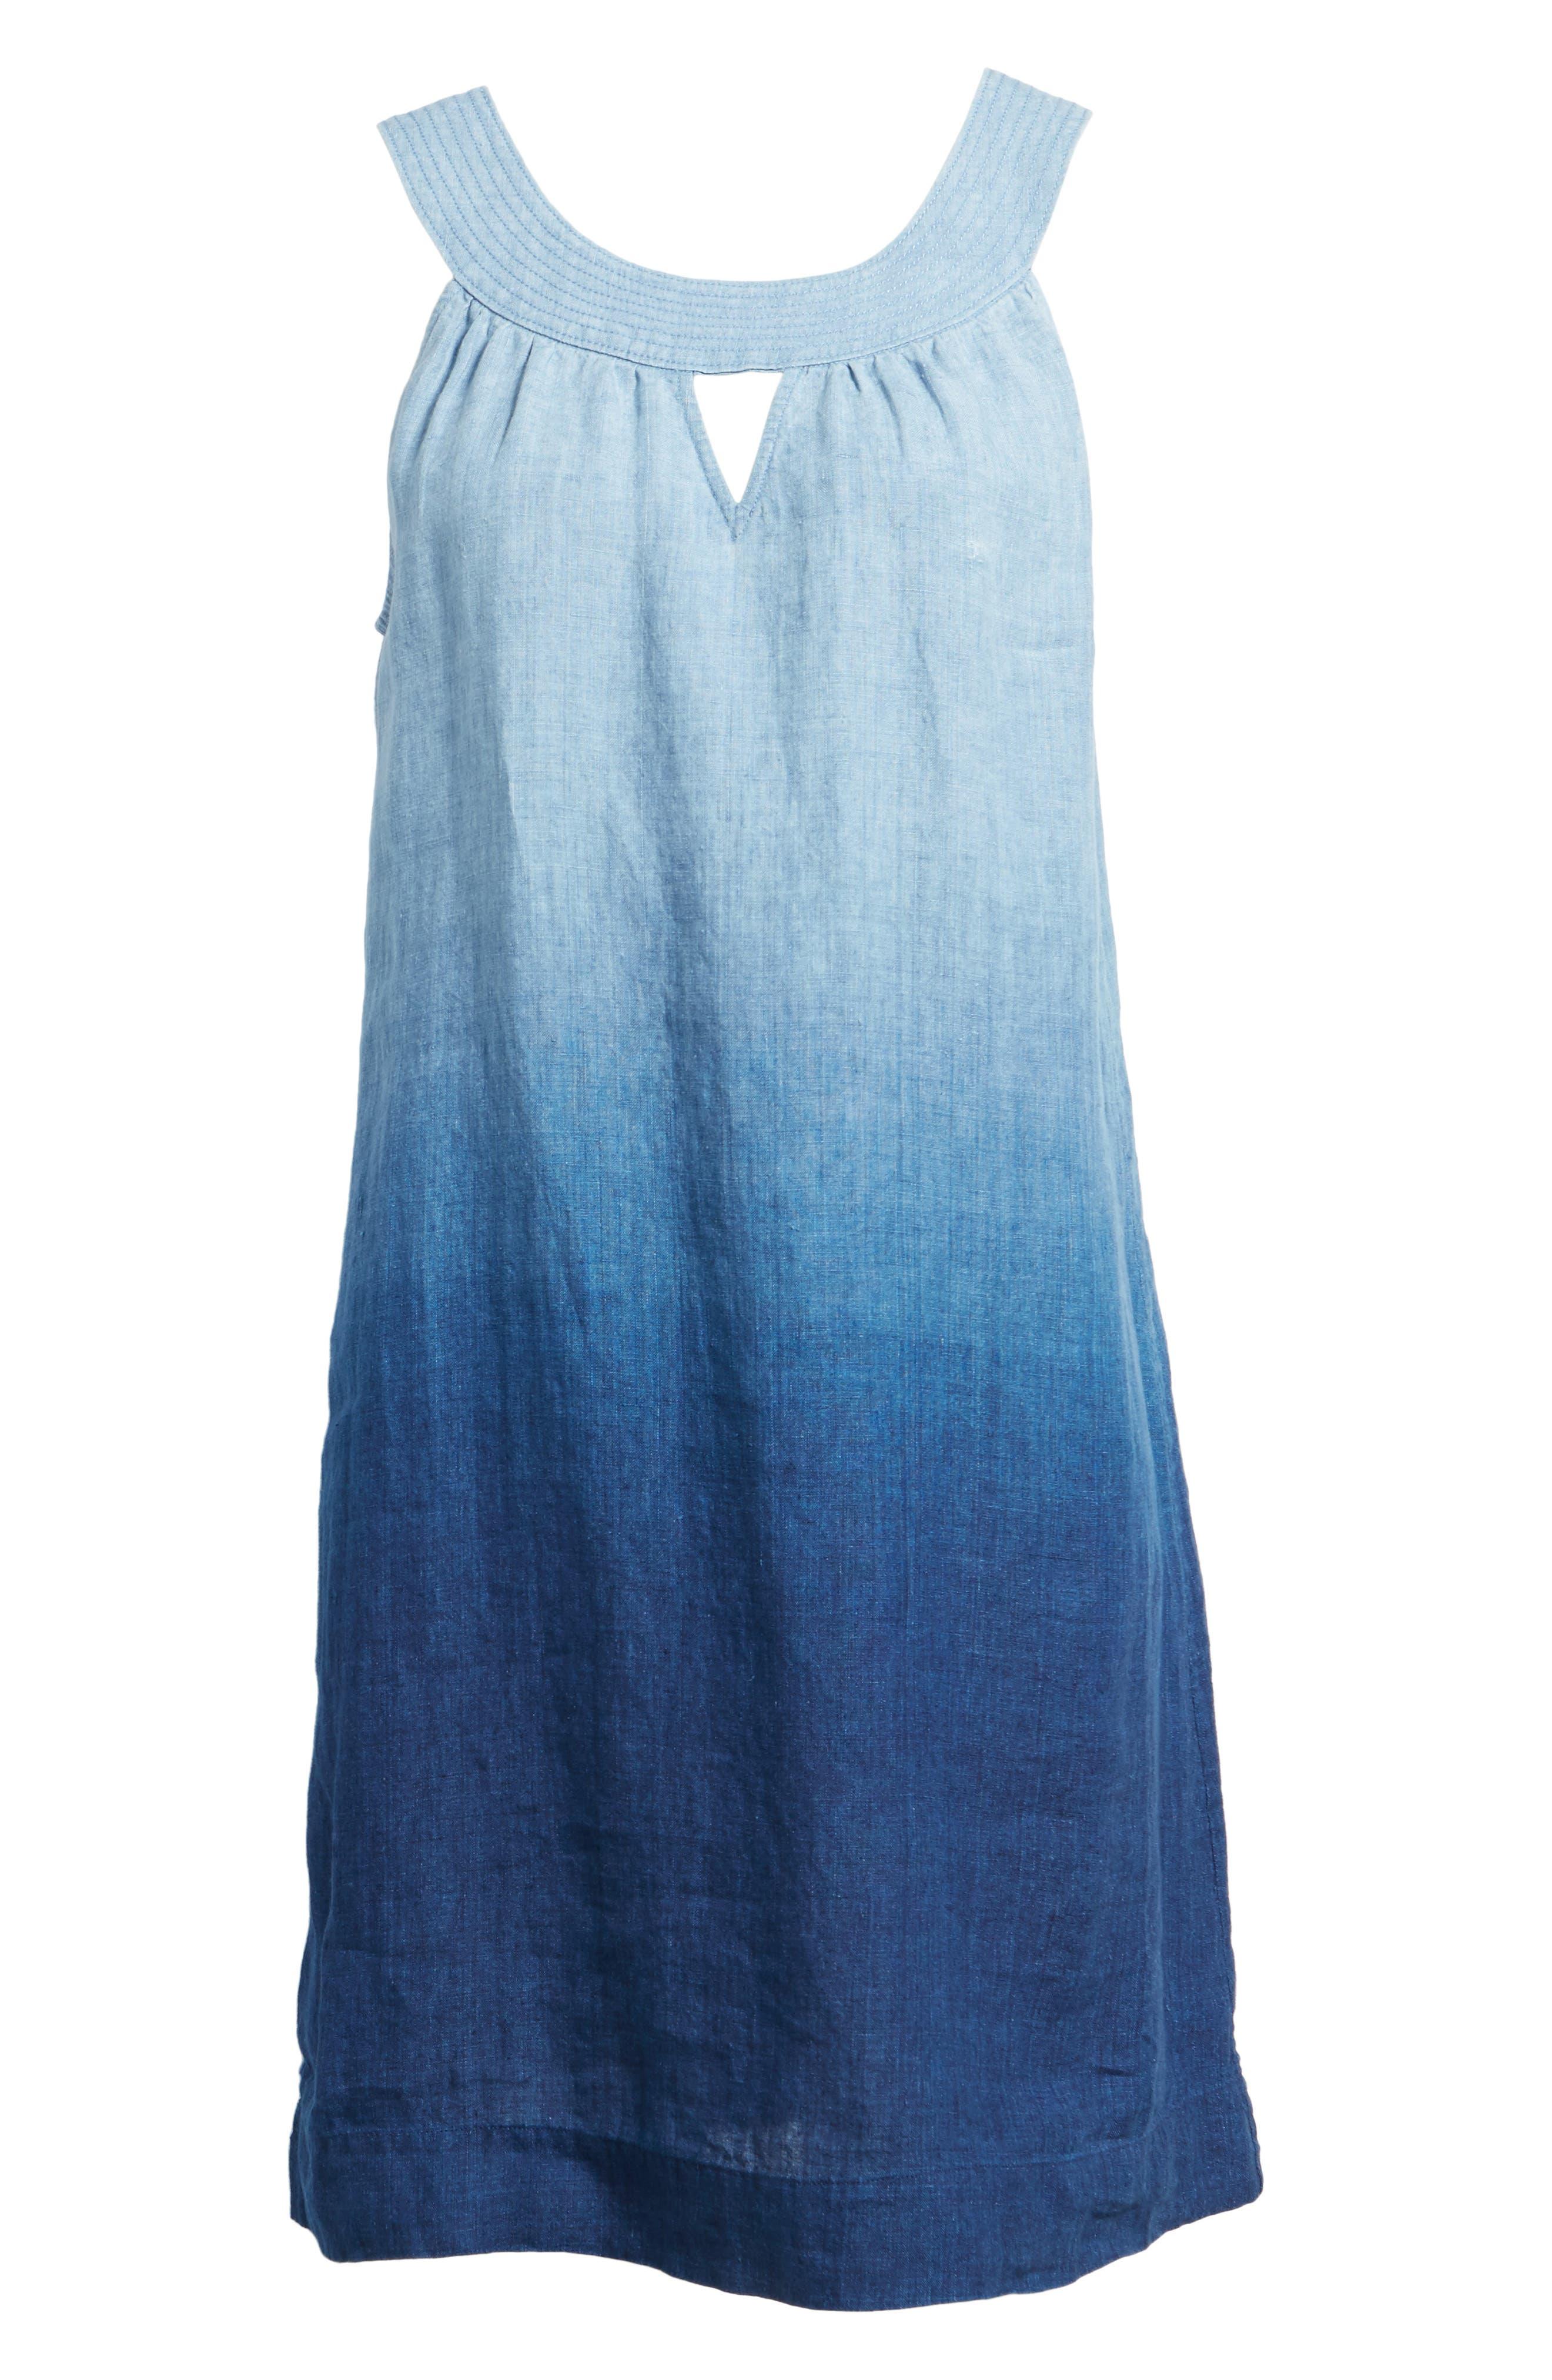 Indigo Dip Dyed Shift Dress,                             Alternate thumbnail 6, color,                             Dark Indigo Wash